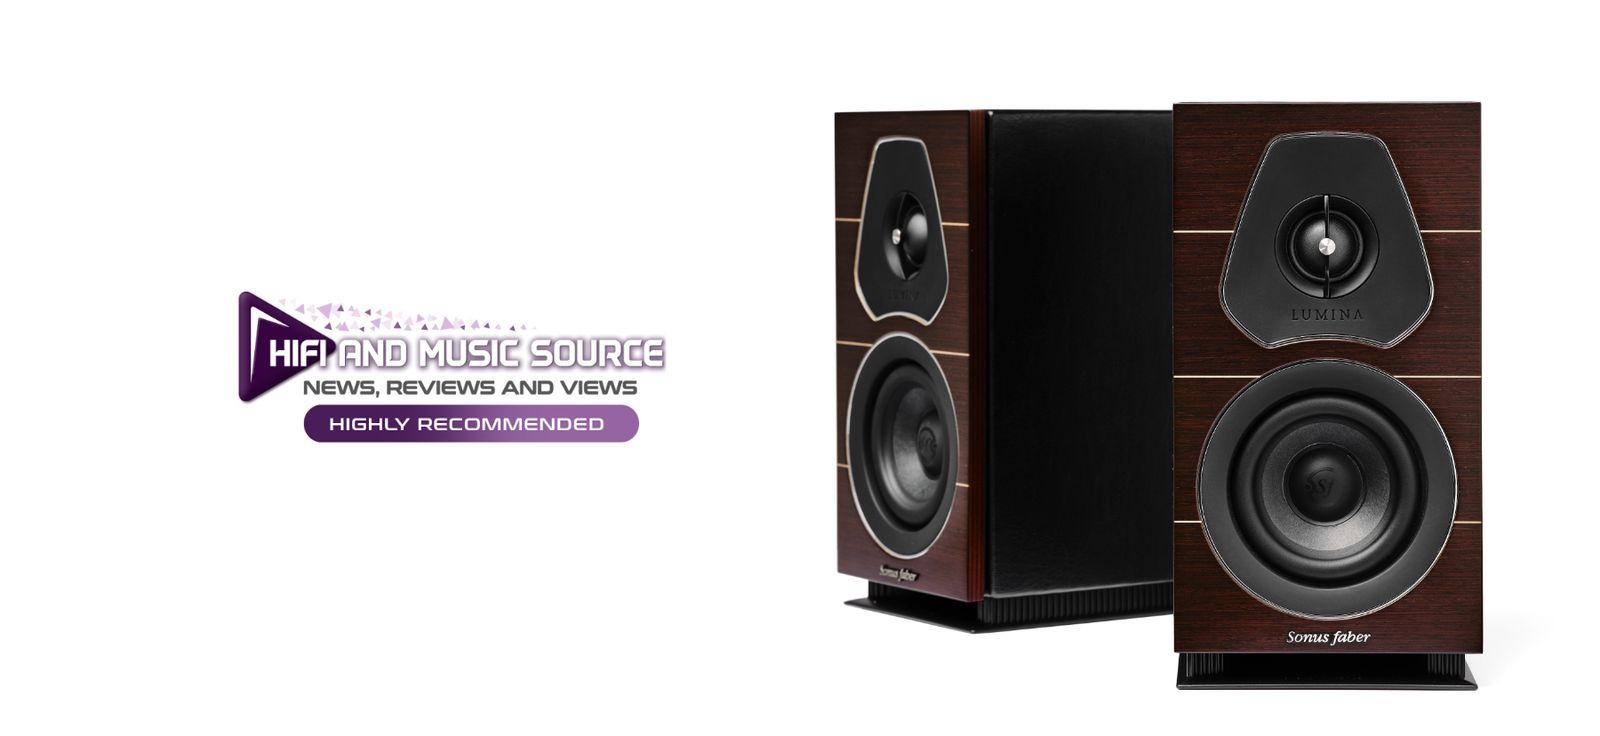 hifiandmusicsource.com reviews the Sonus faber Lumina I speakers